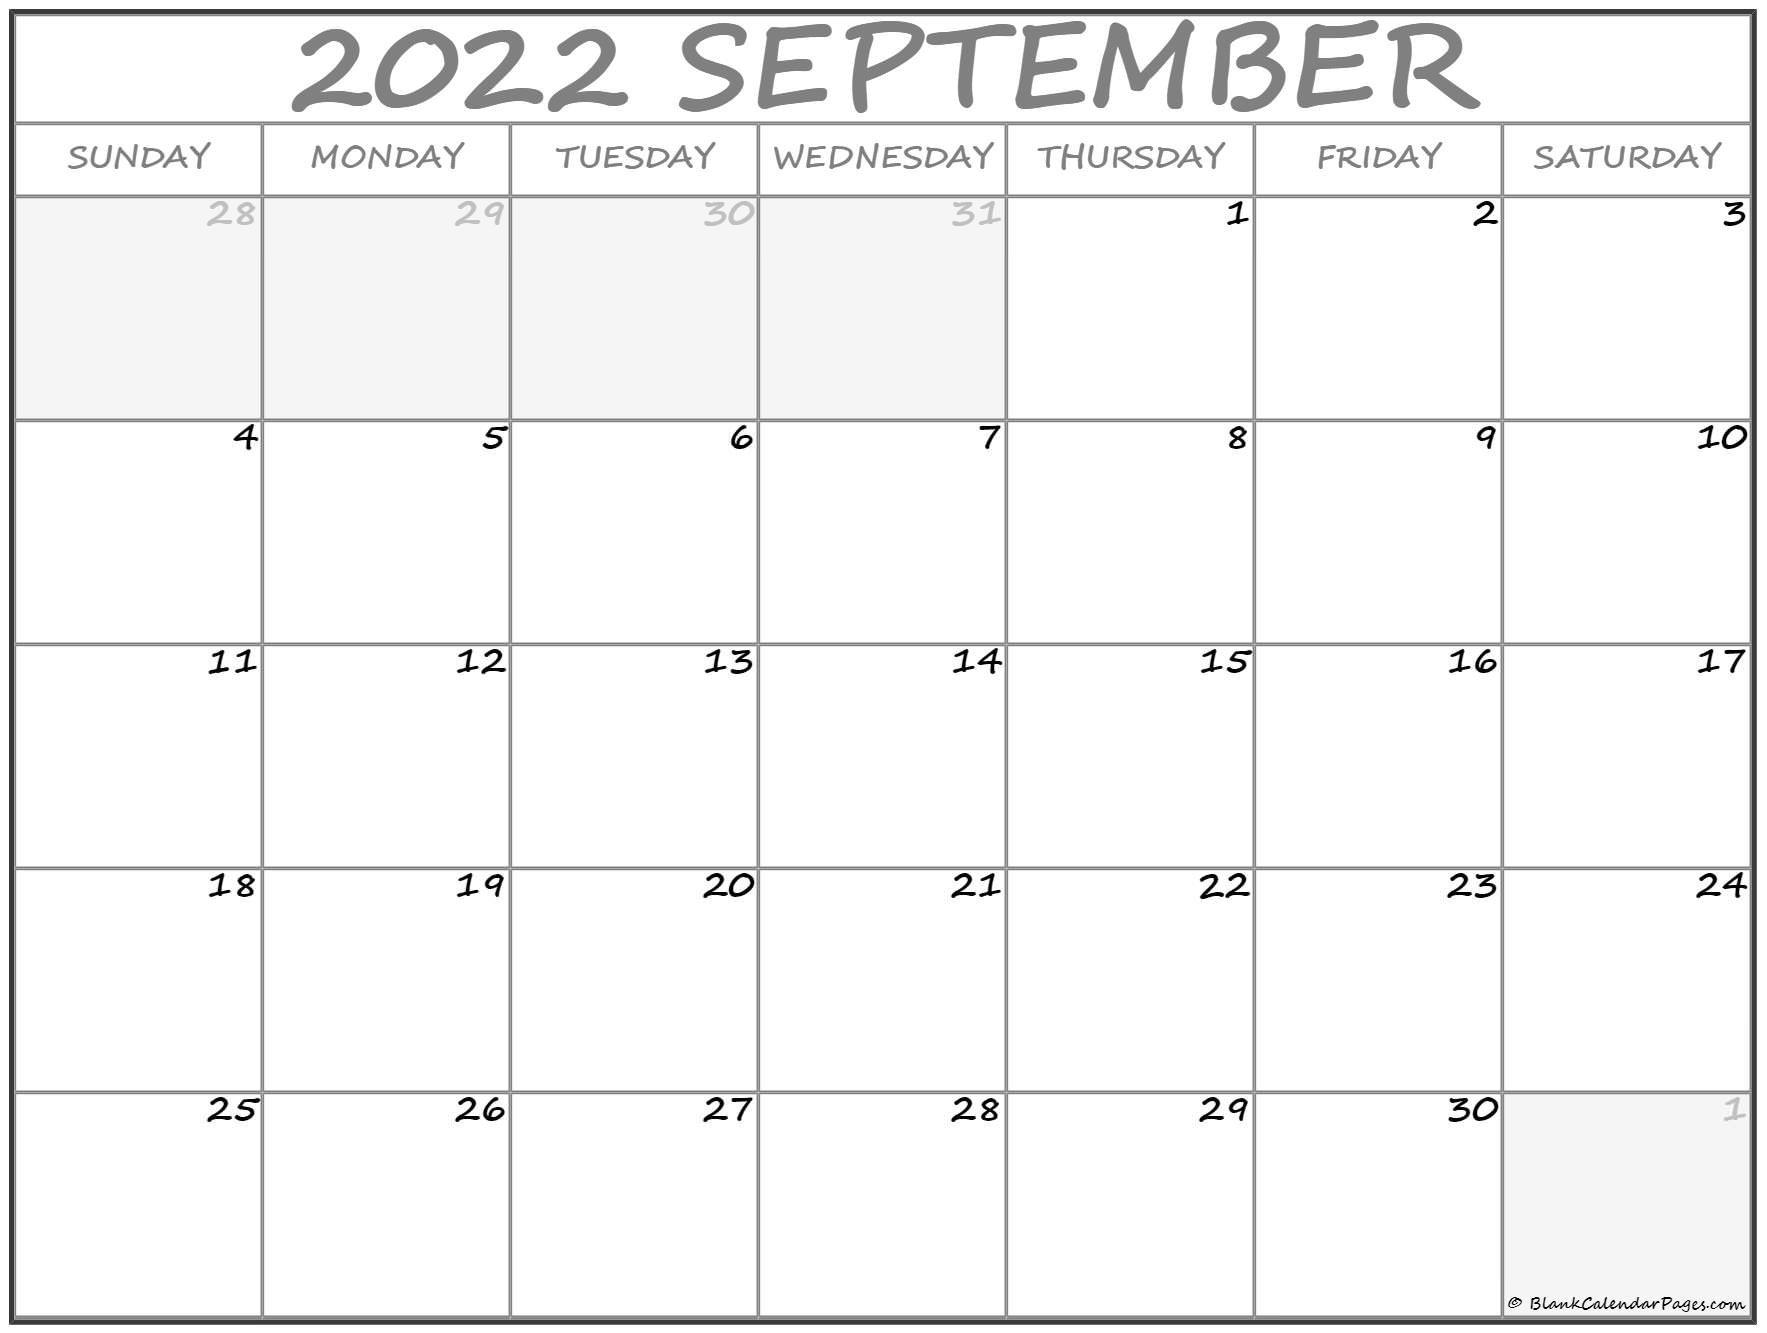 September 2022 Calendar   Free Printable Calendar Templates intended for 2022 Weekly Planner Printable Image